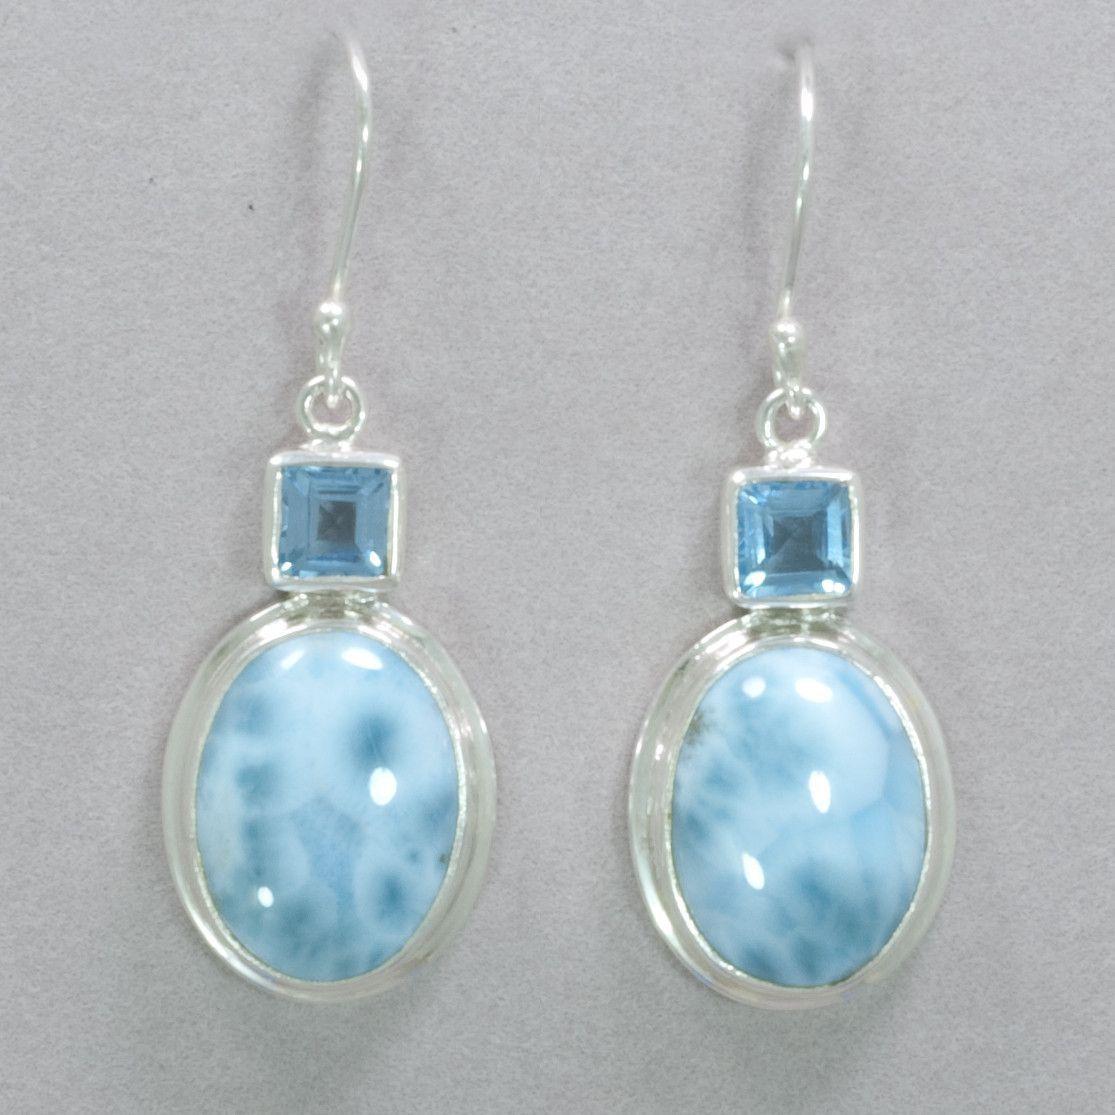 0de659a5c Larimar and Blue Topaz Earrings Topaz Earrings, Rainbow Bridge, White  Patterns, Blue Topaz